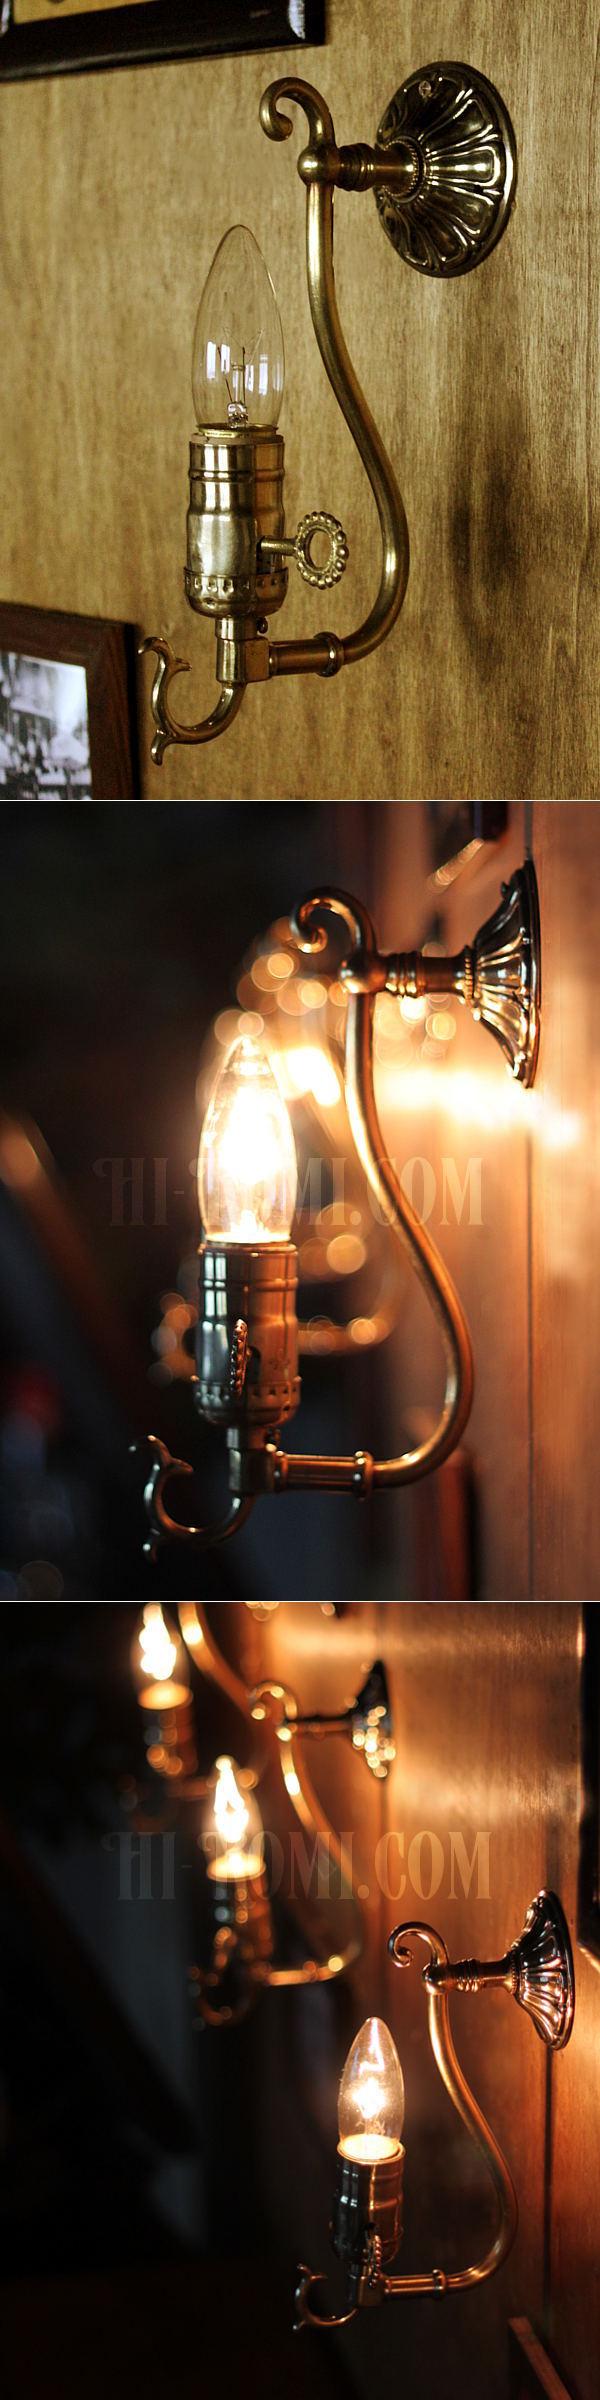 LEVITON社製真鍮ソケット付きコロニアルフォーリッジスクロールミニブラケットランプA/アメリカンヴィクトリアン壁掛照明ウォールランプ